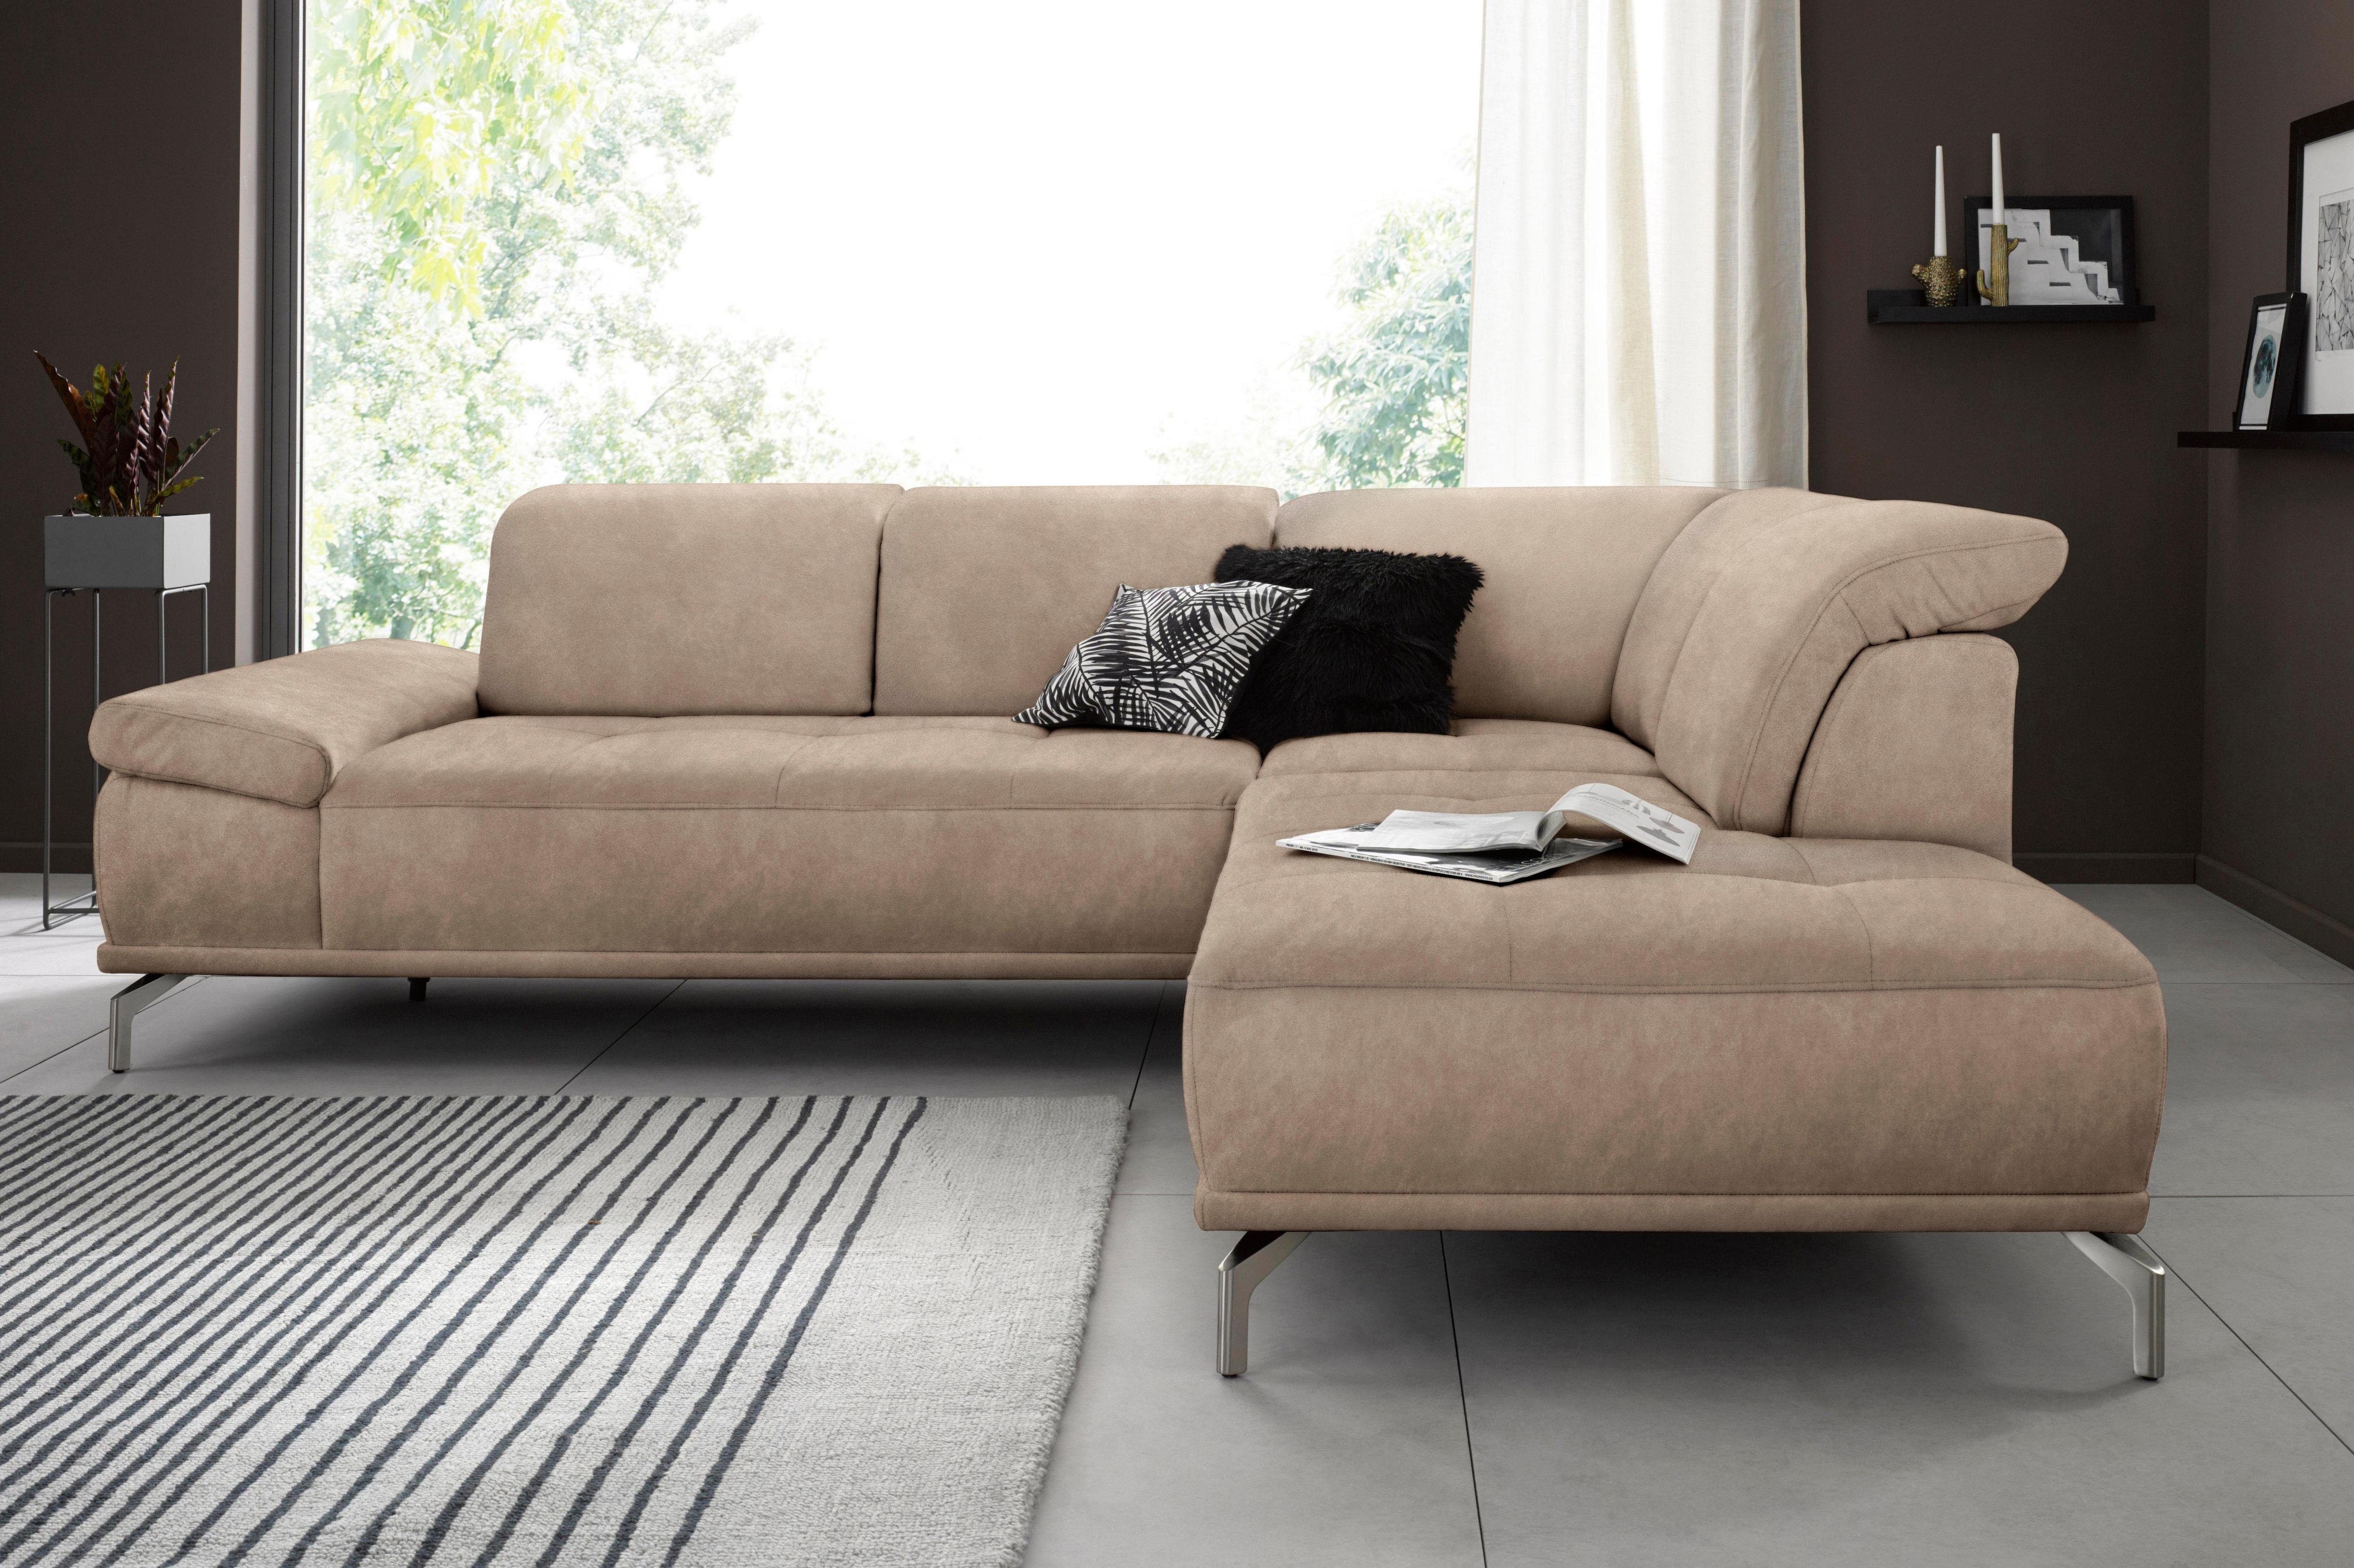 Places of Style Ecksofa Caluna   Wohnzimmer > Sofas & Couches > Ecksofas & Eckcouches   Beige   Microfaser   Places Of Style